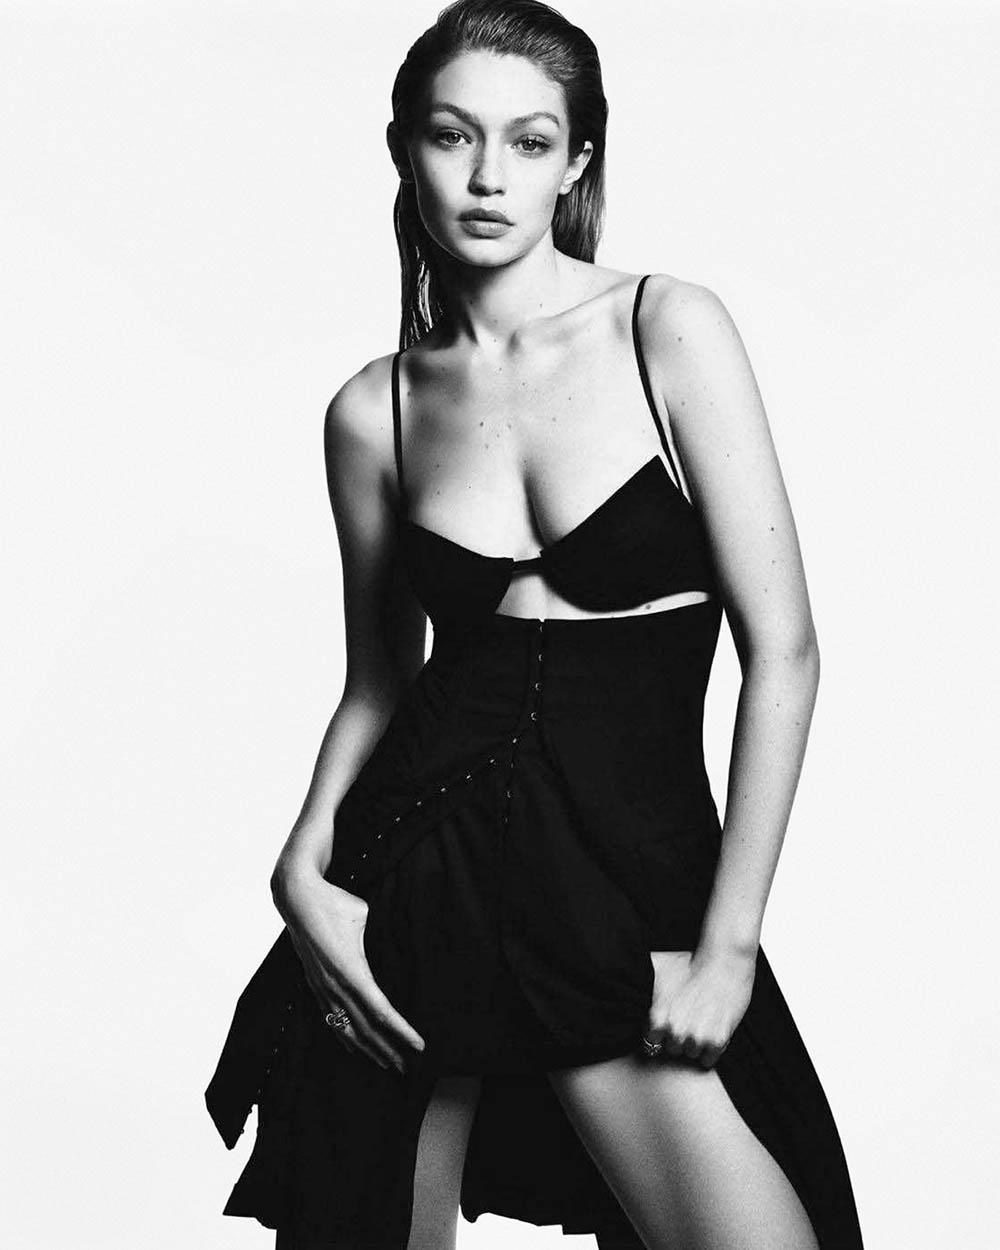 Gigi Hadid covers Vogue Japan June 2018 by Luigi & Iango